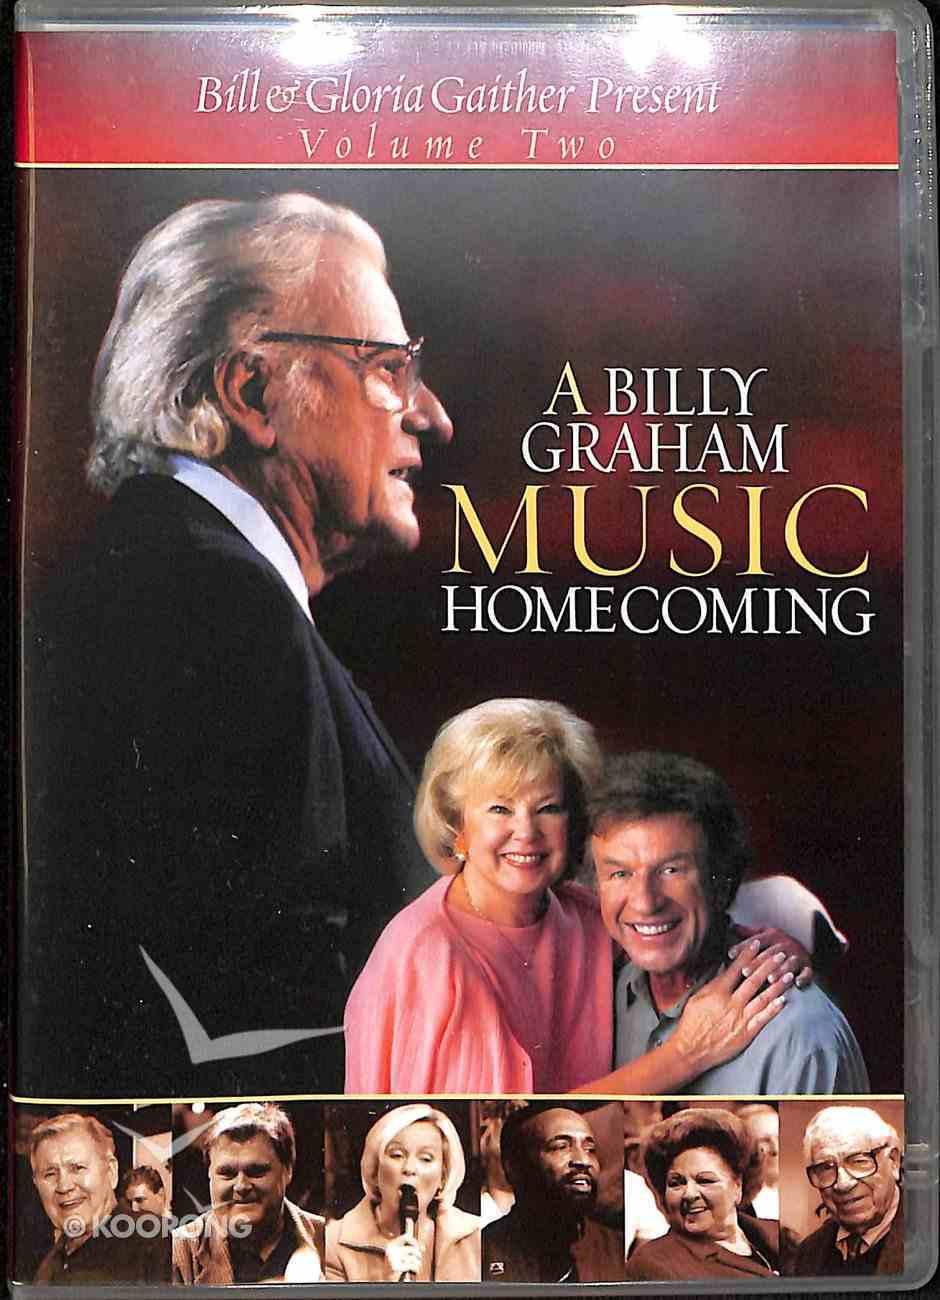 A Billy Graham Music Homecoming (Volume 2) (Gaither Gospel Series) DVD